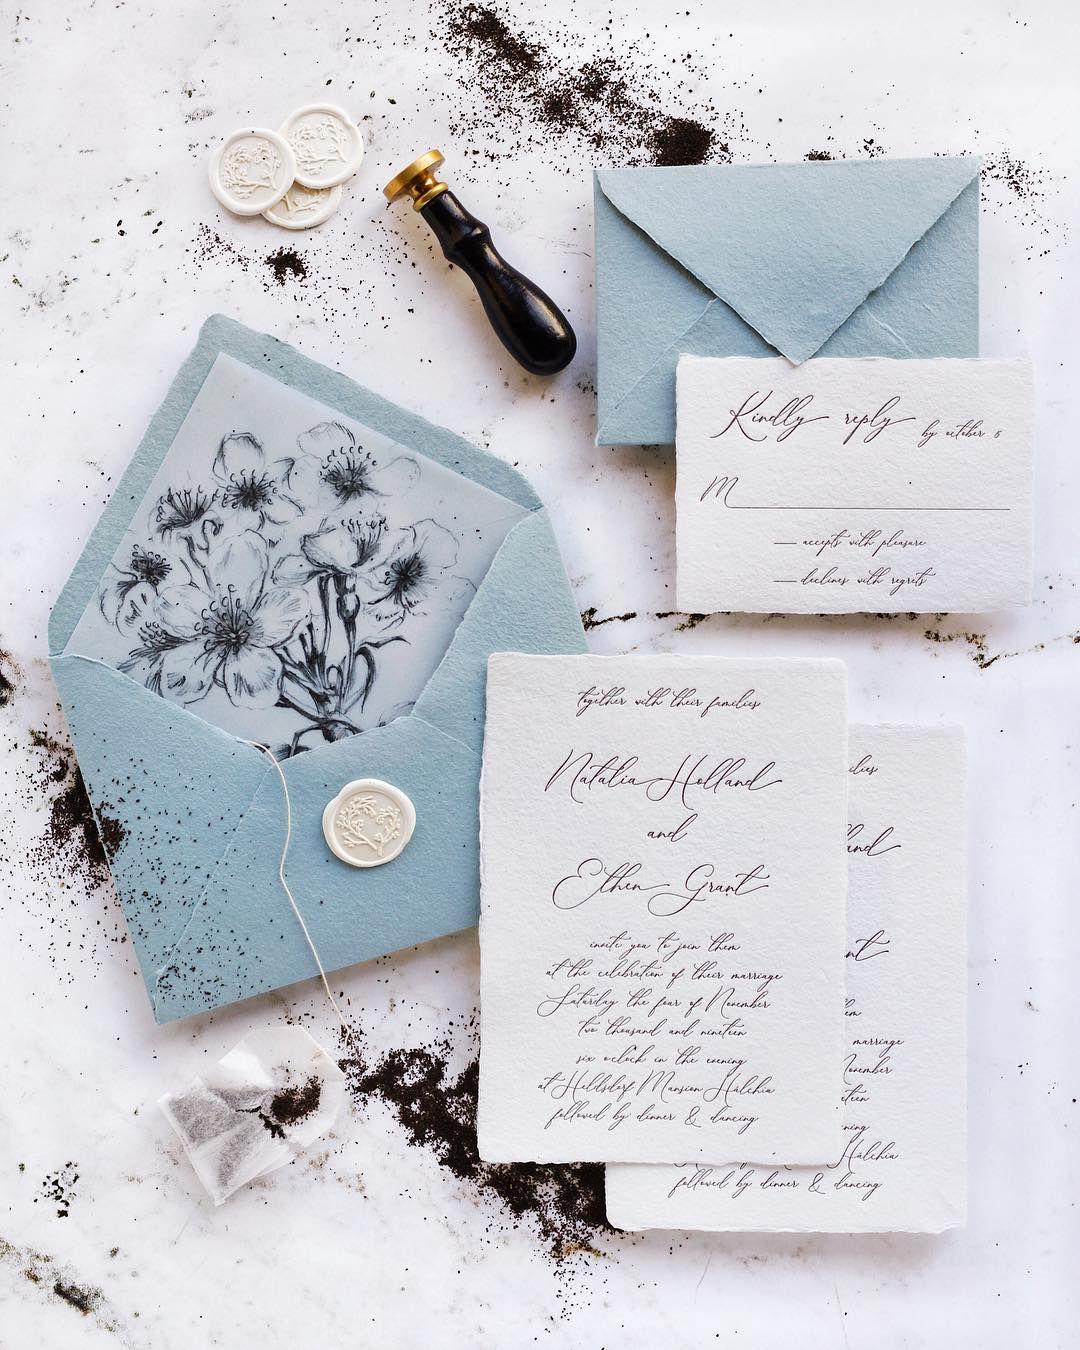 Blue Handmade Paper Letterpress Wedding Suite With Vellum Liner Wedding Ceremony Invitations Fun Wedding Invitations Letterpress Wedding